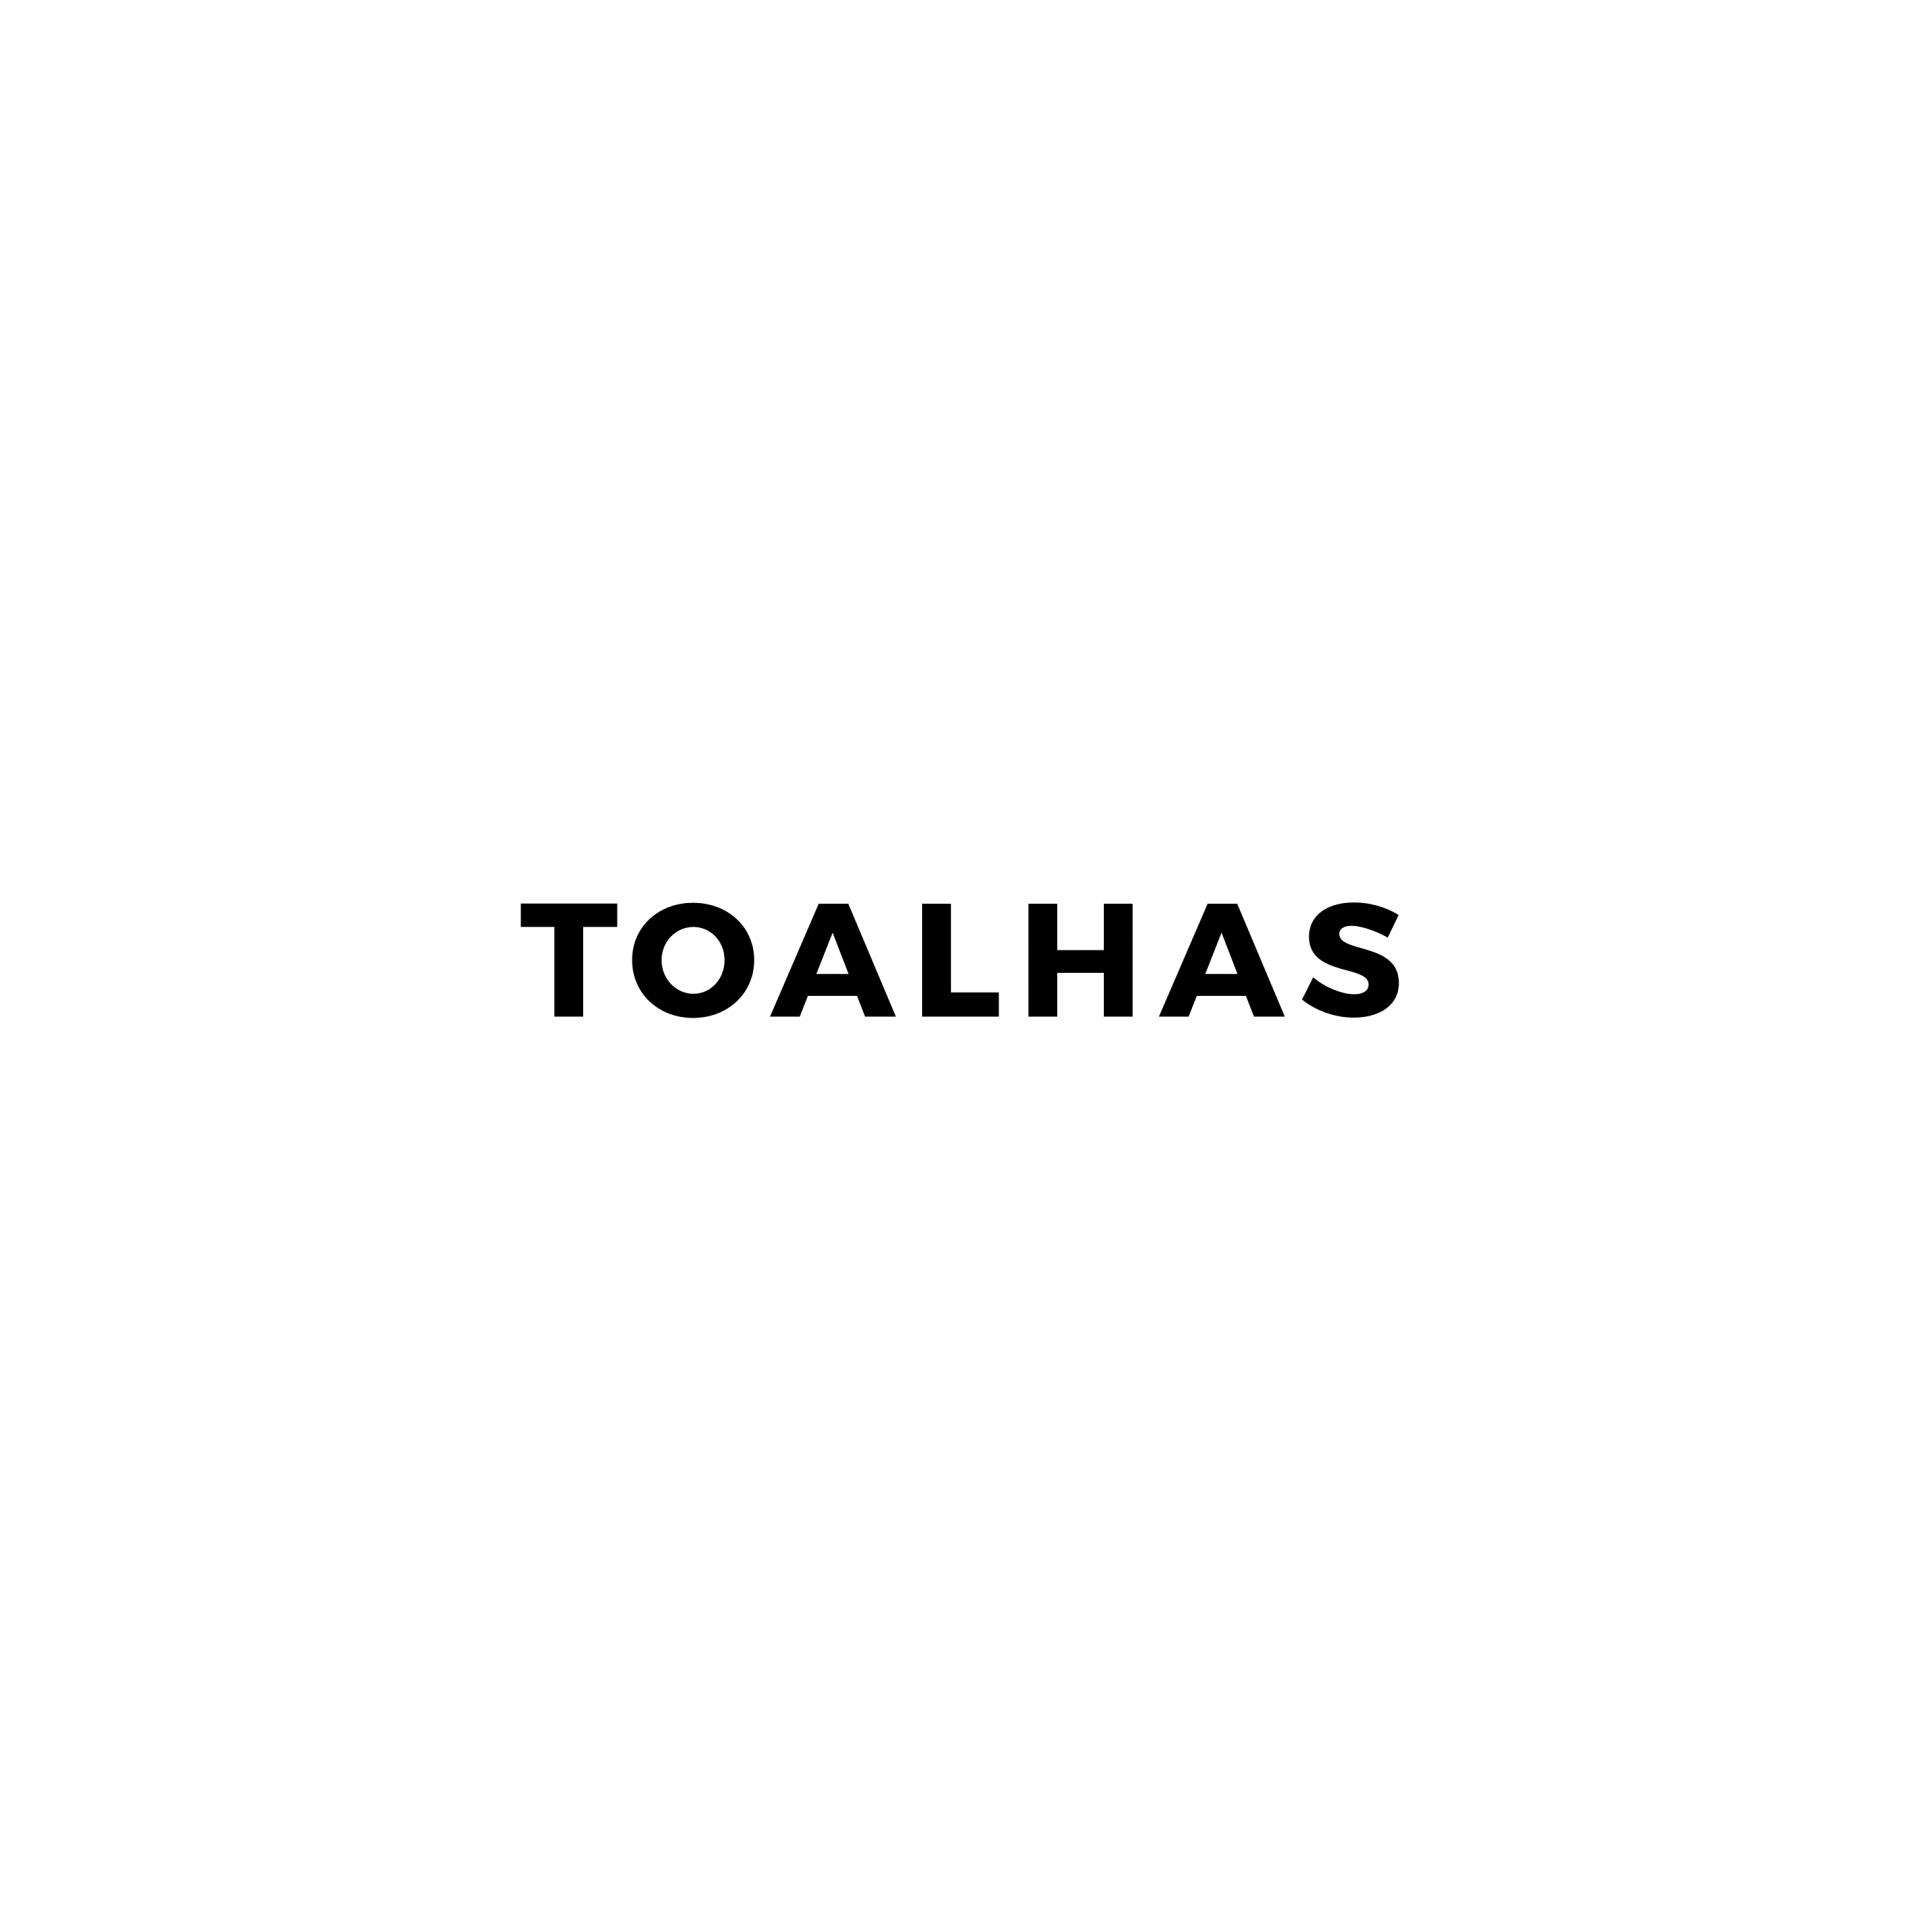 Toalhas 02